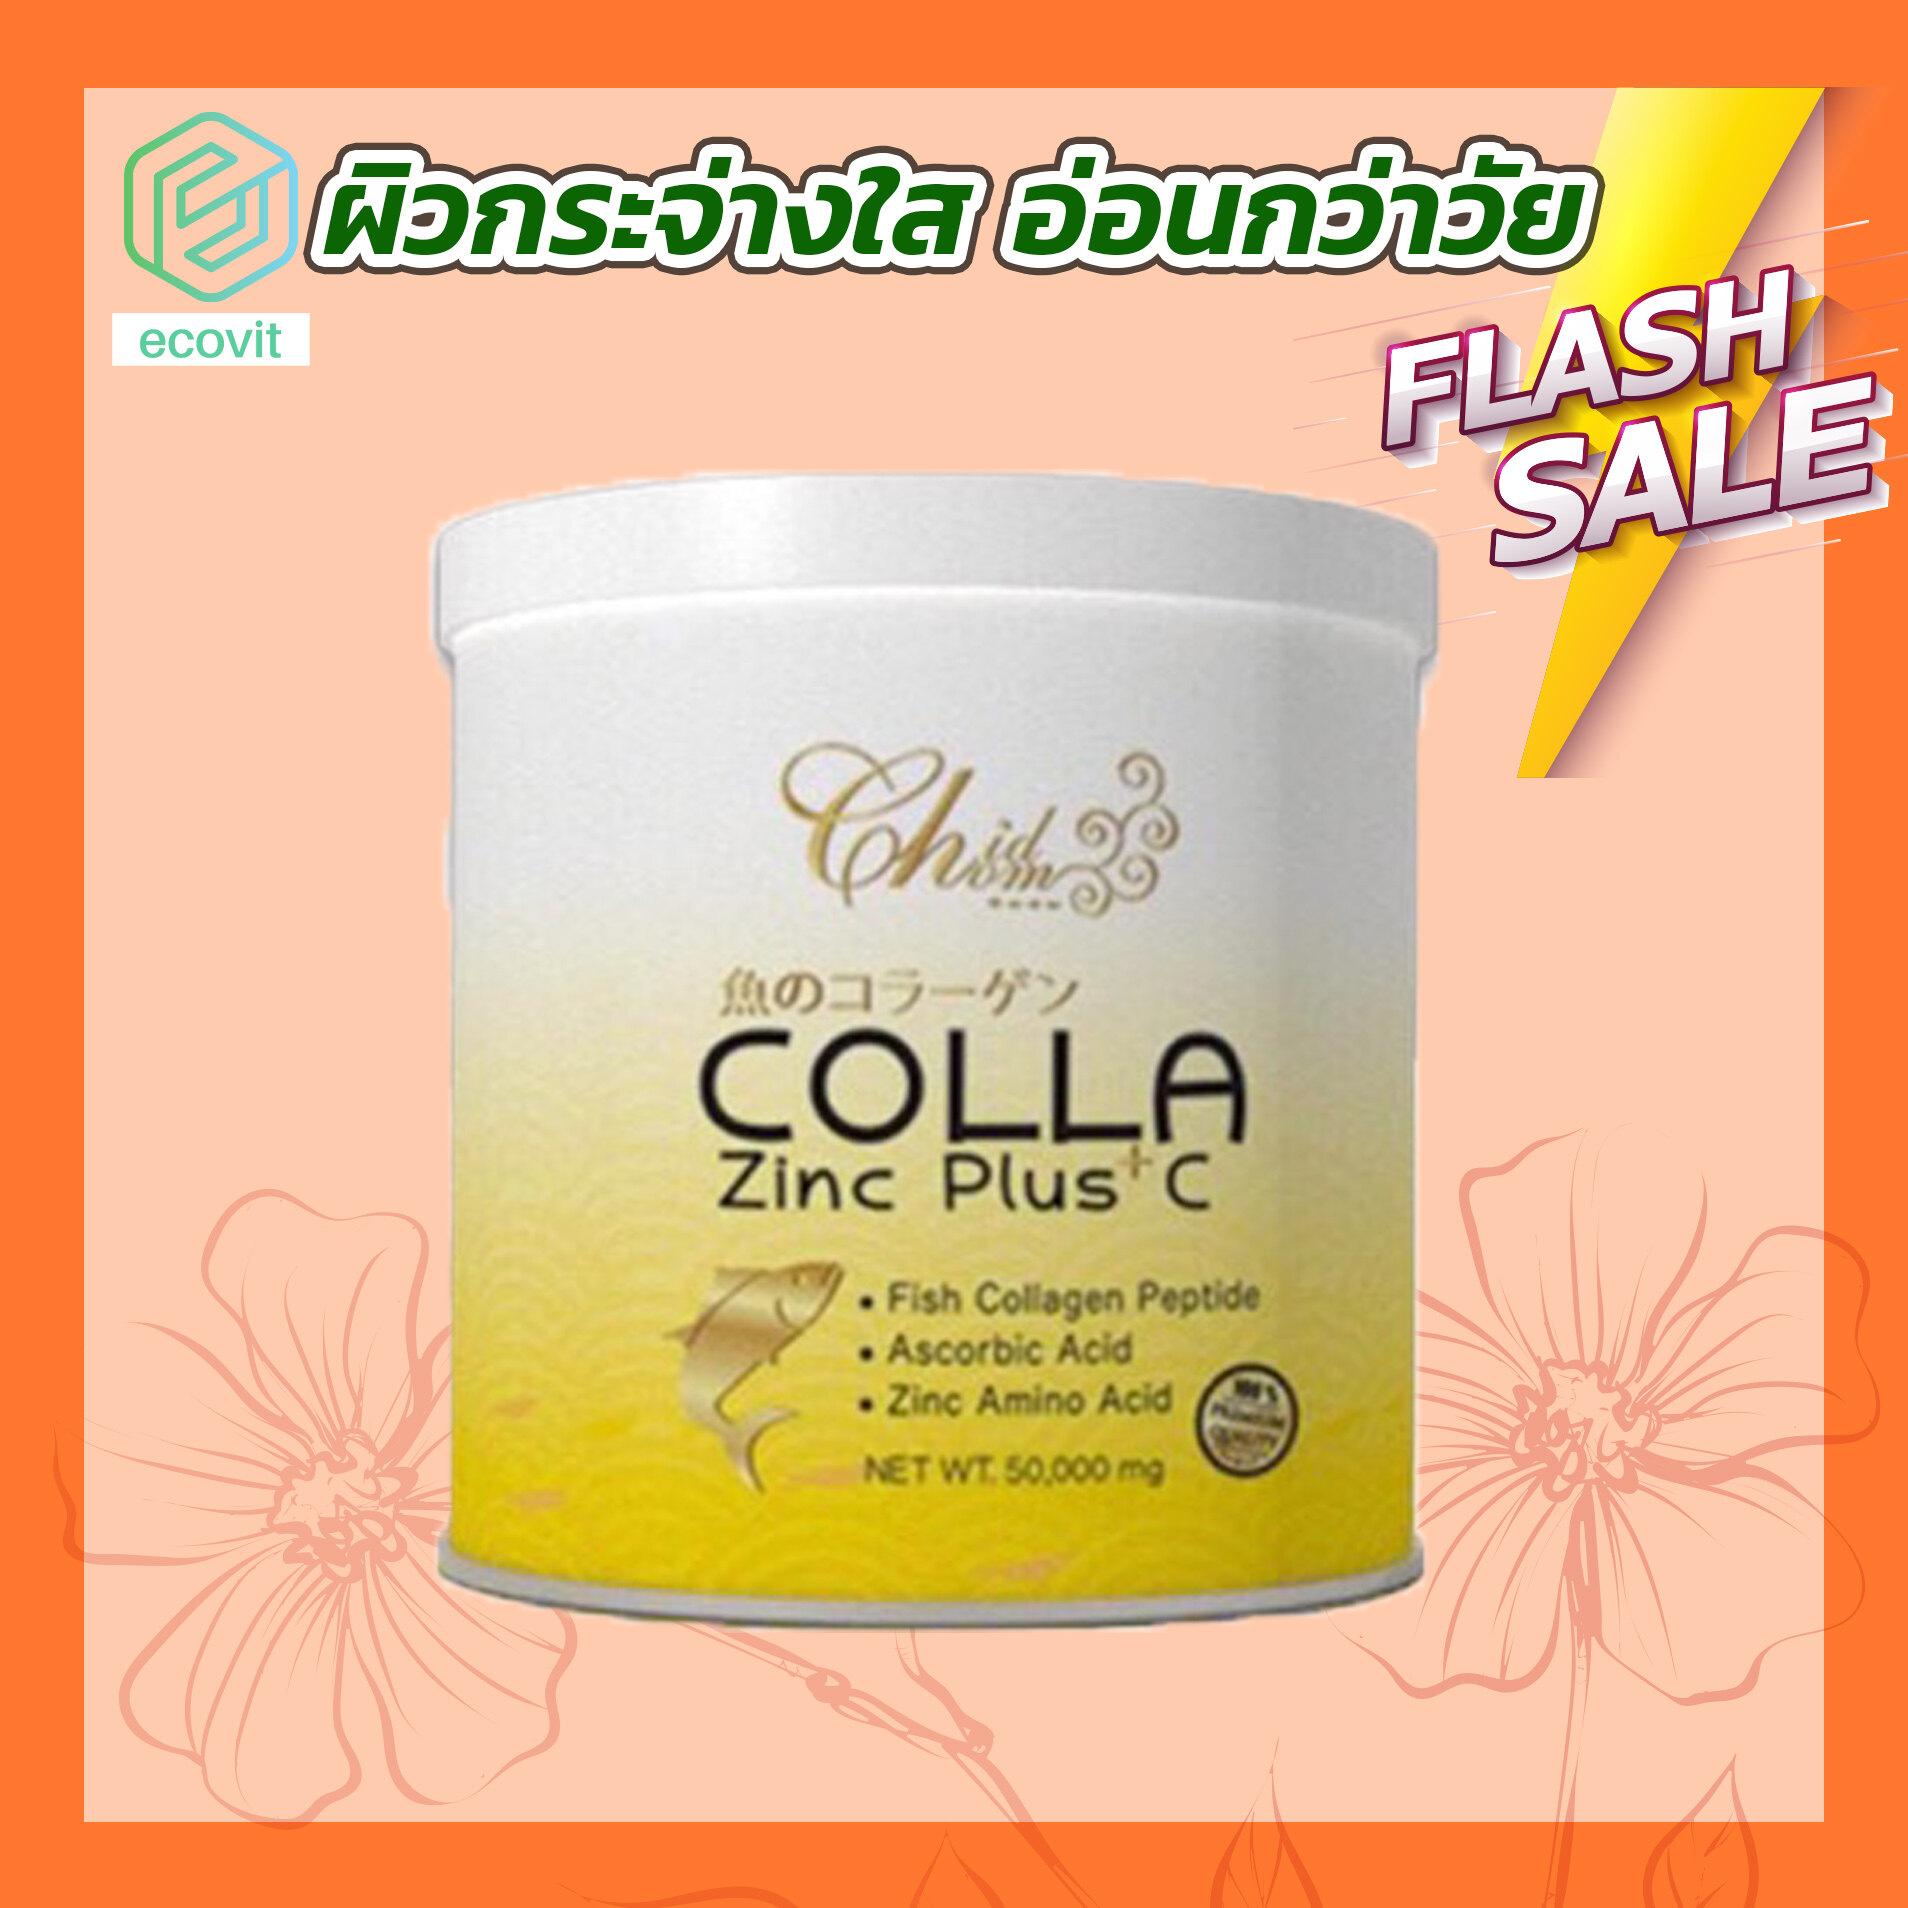 Colla Zinc Plus C อาหารเสริม คอลลาเจน พลัส วิตามินซี [50 กรัม][1 กระปุก]  วิตามินซี.